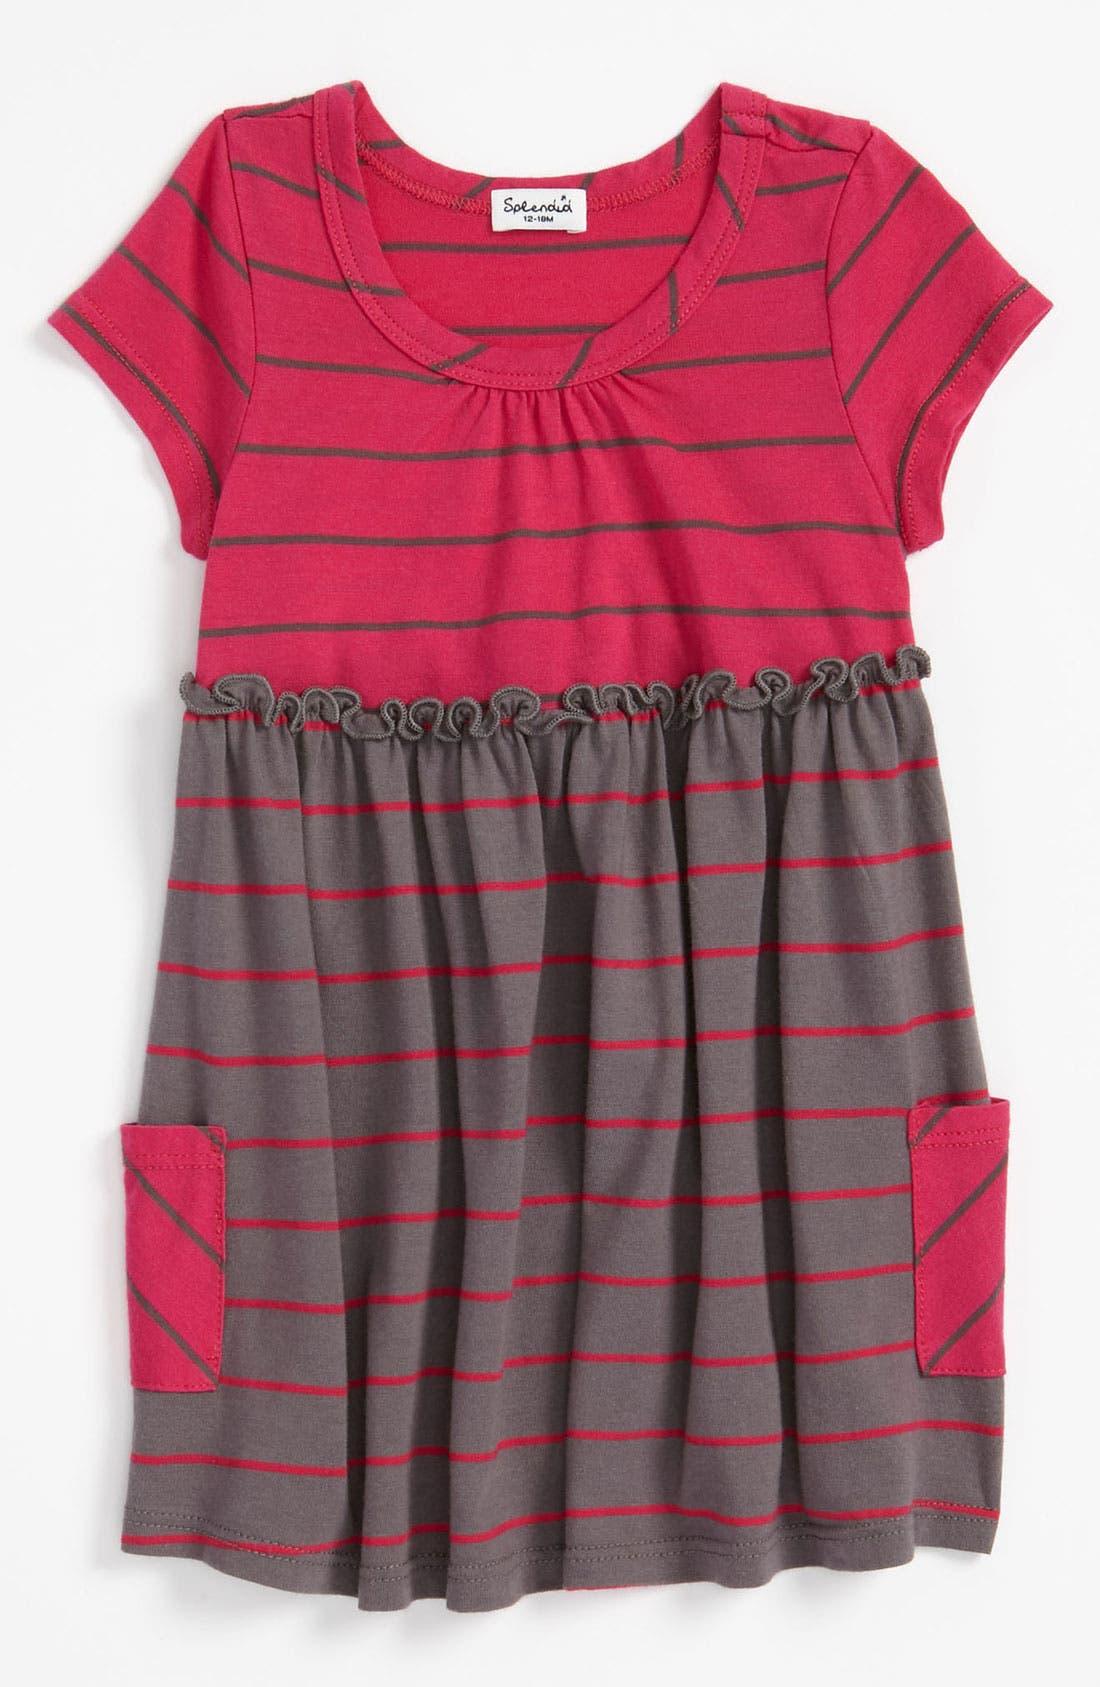 Main Image - Splendid 'Lacrosse' Stripe Dress (Infant)